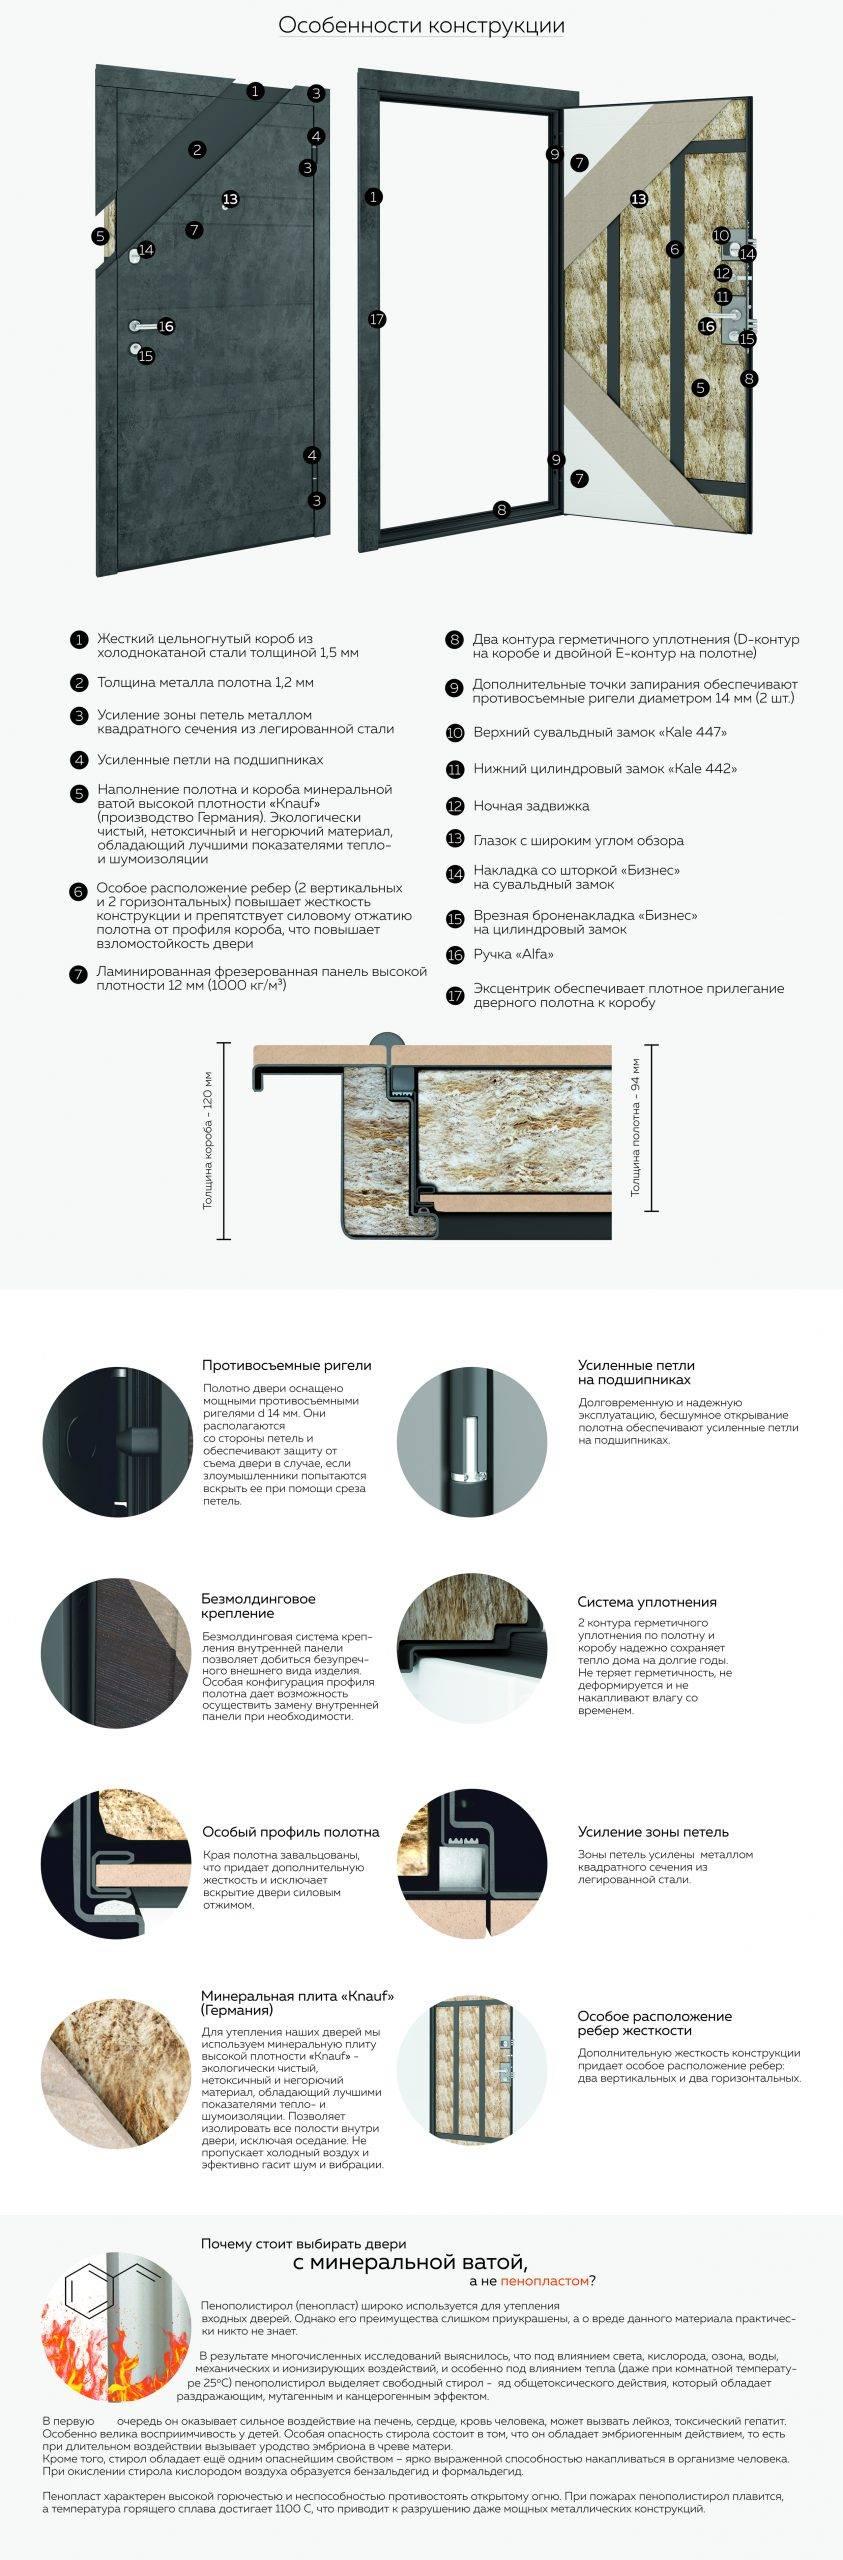 Металюкс Гранд конструктив